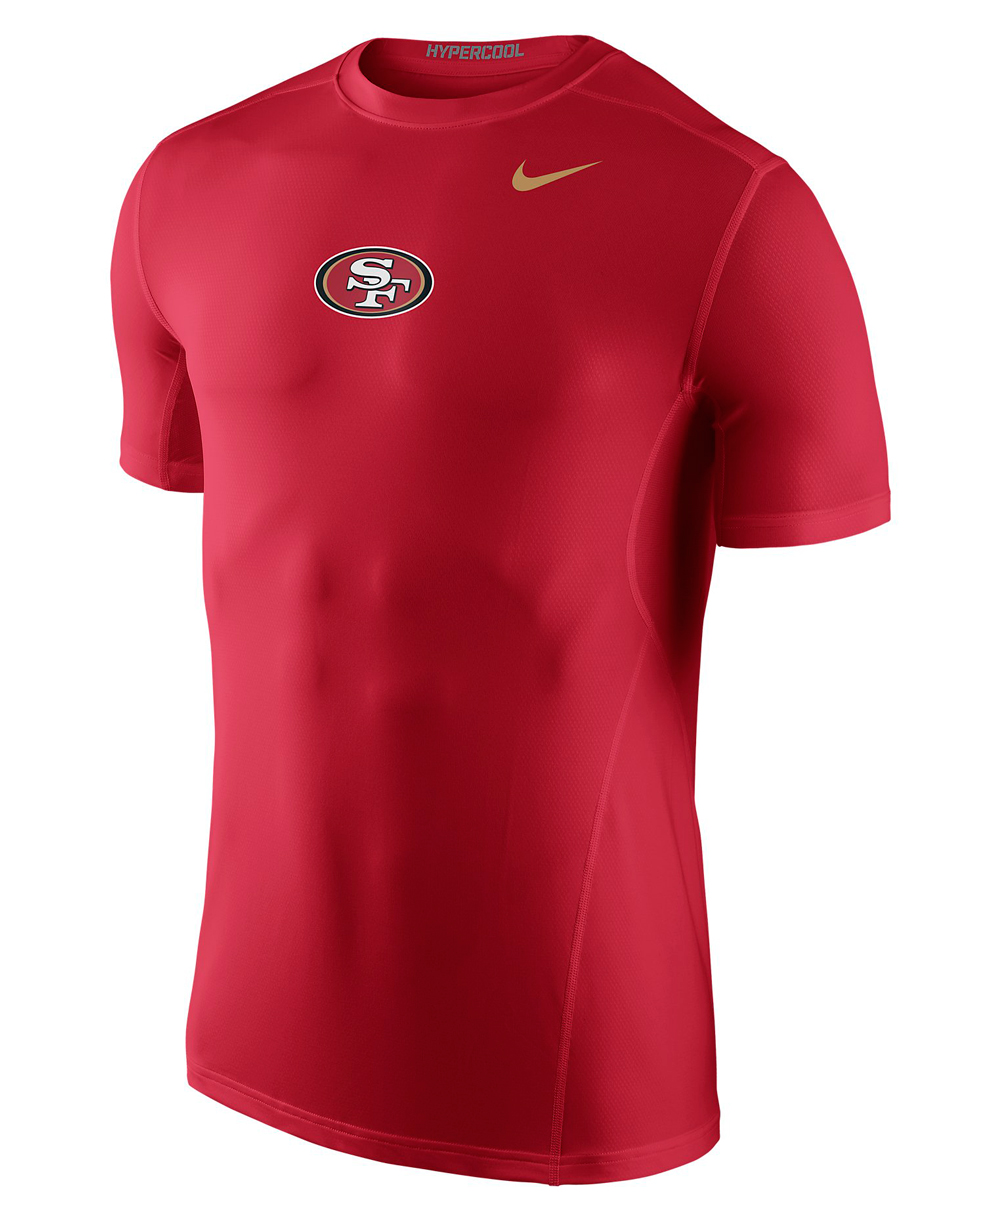 Hypercool Fitted Camiseta de Compresión Manga Larga para Hombre NFL 49ers